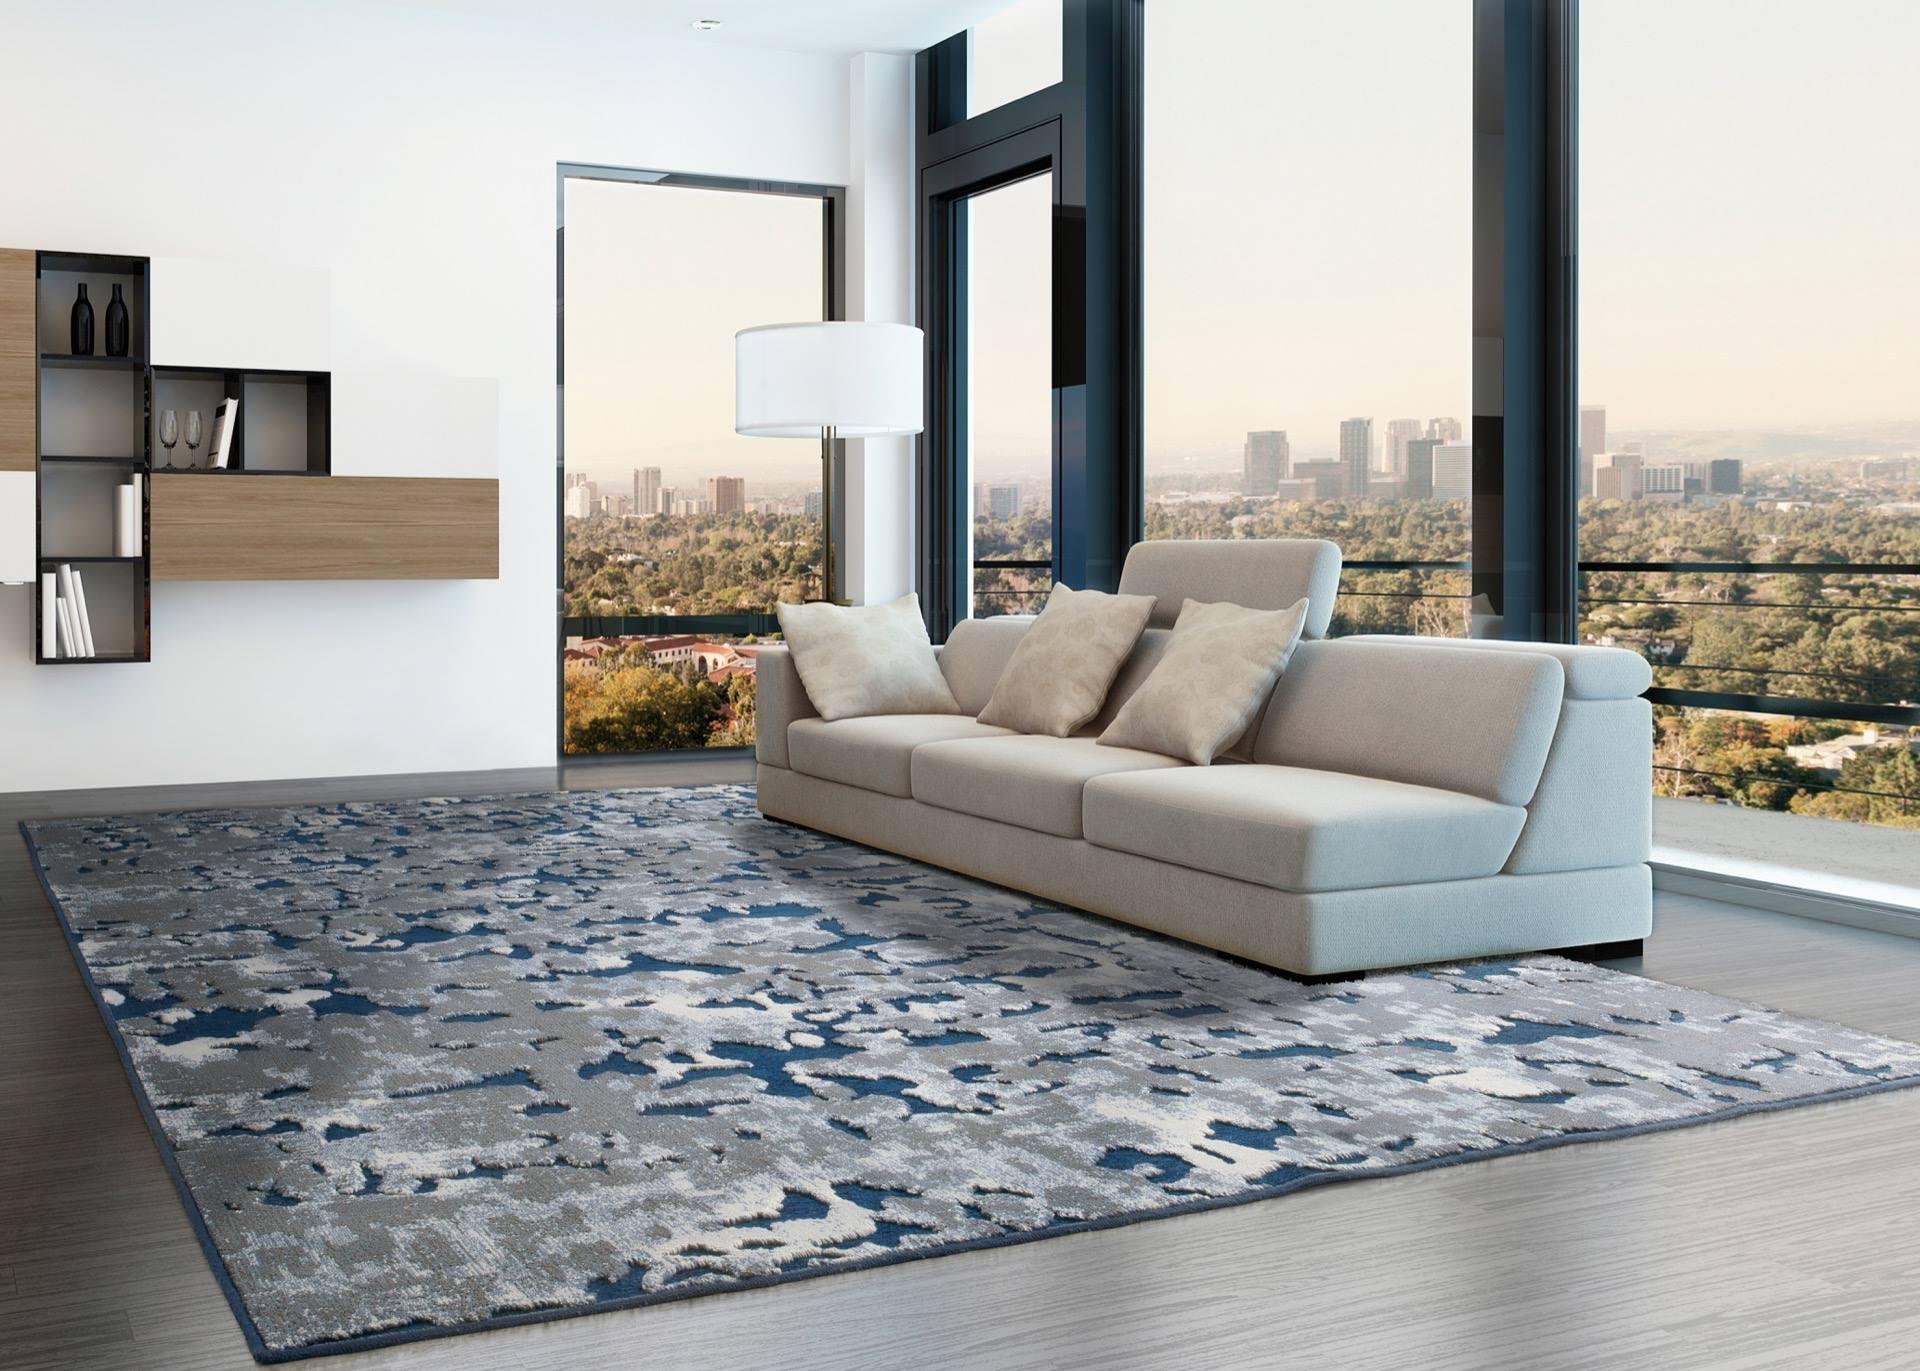 SITAP tappeti di design – AF CasaDesign